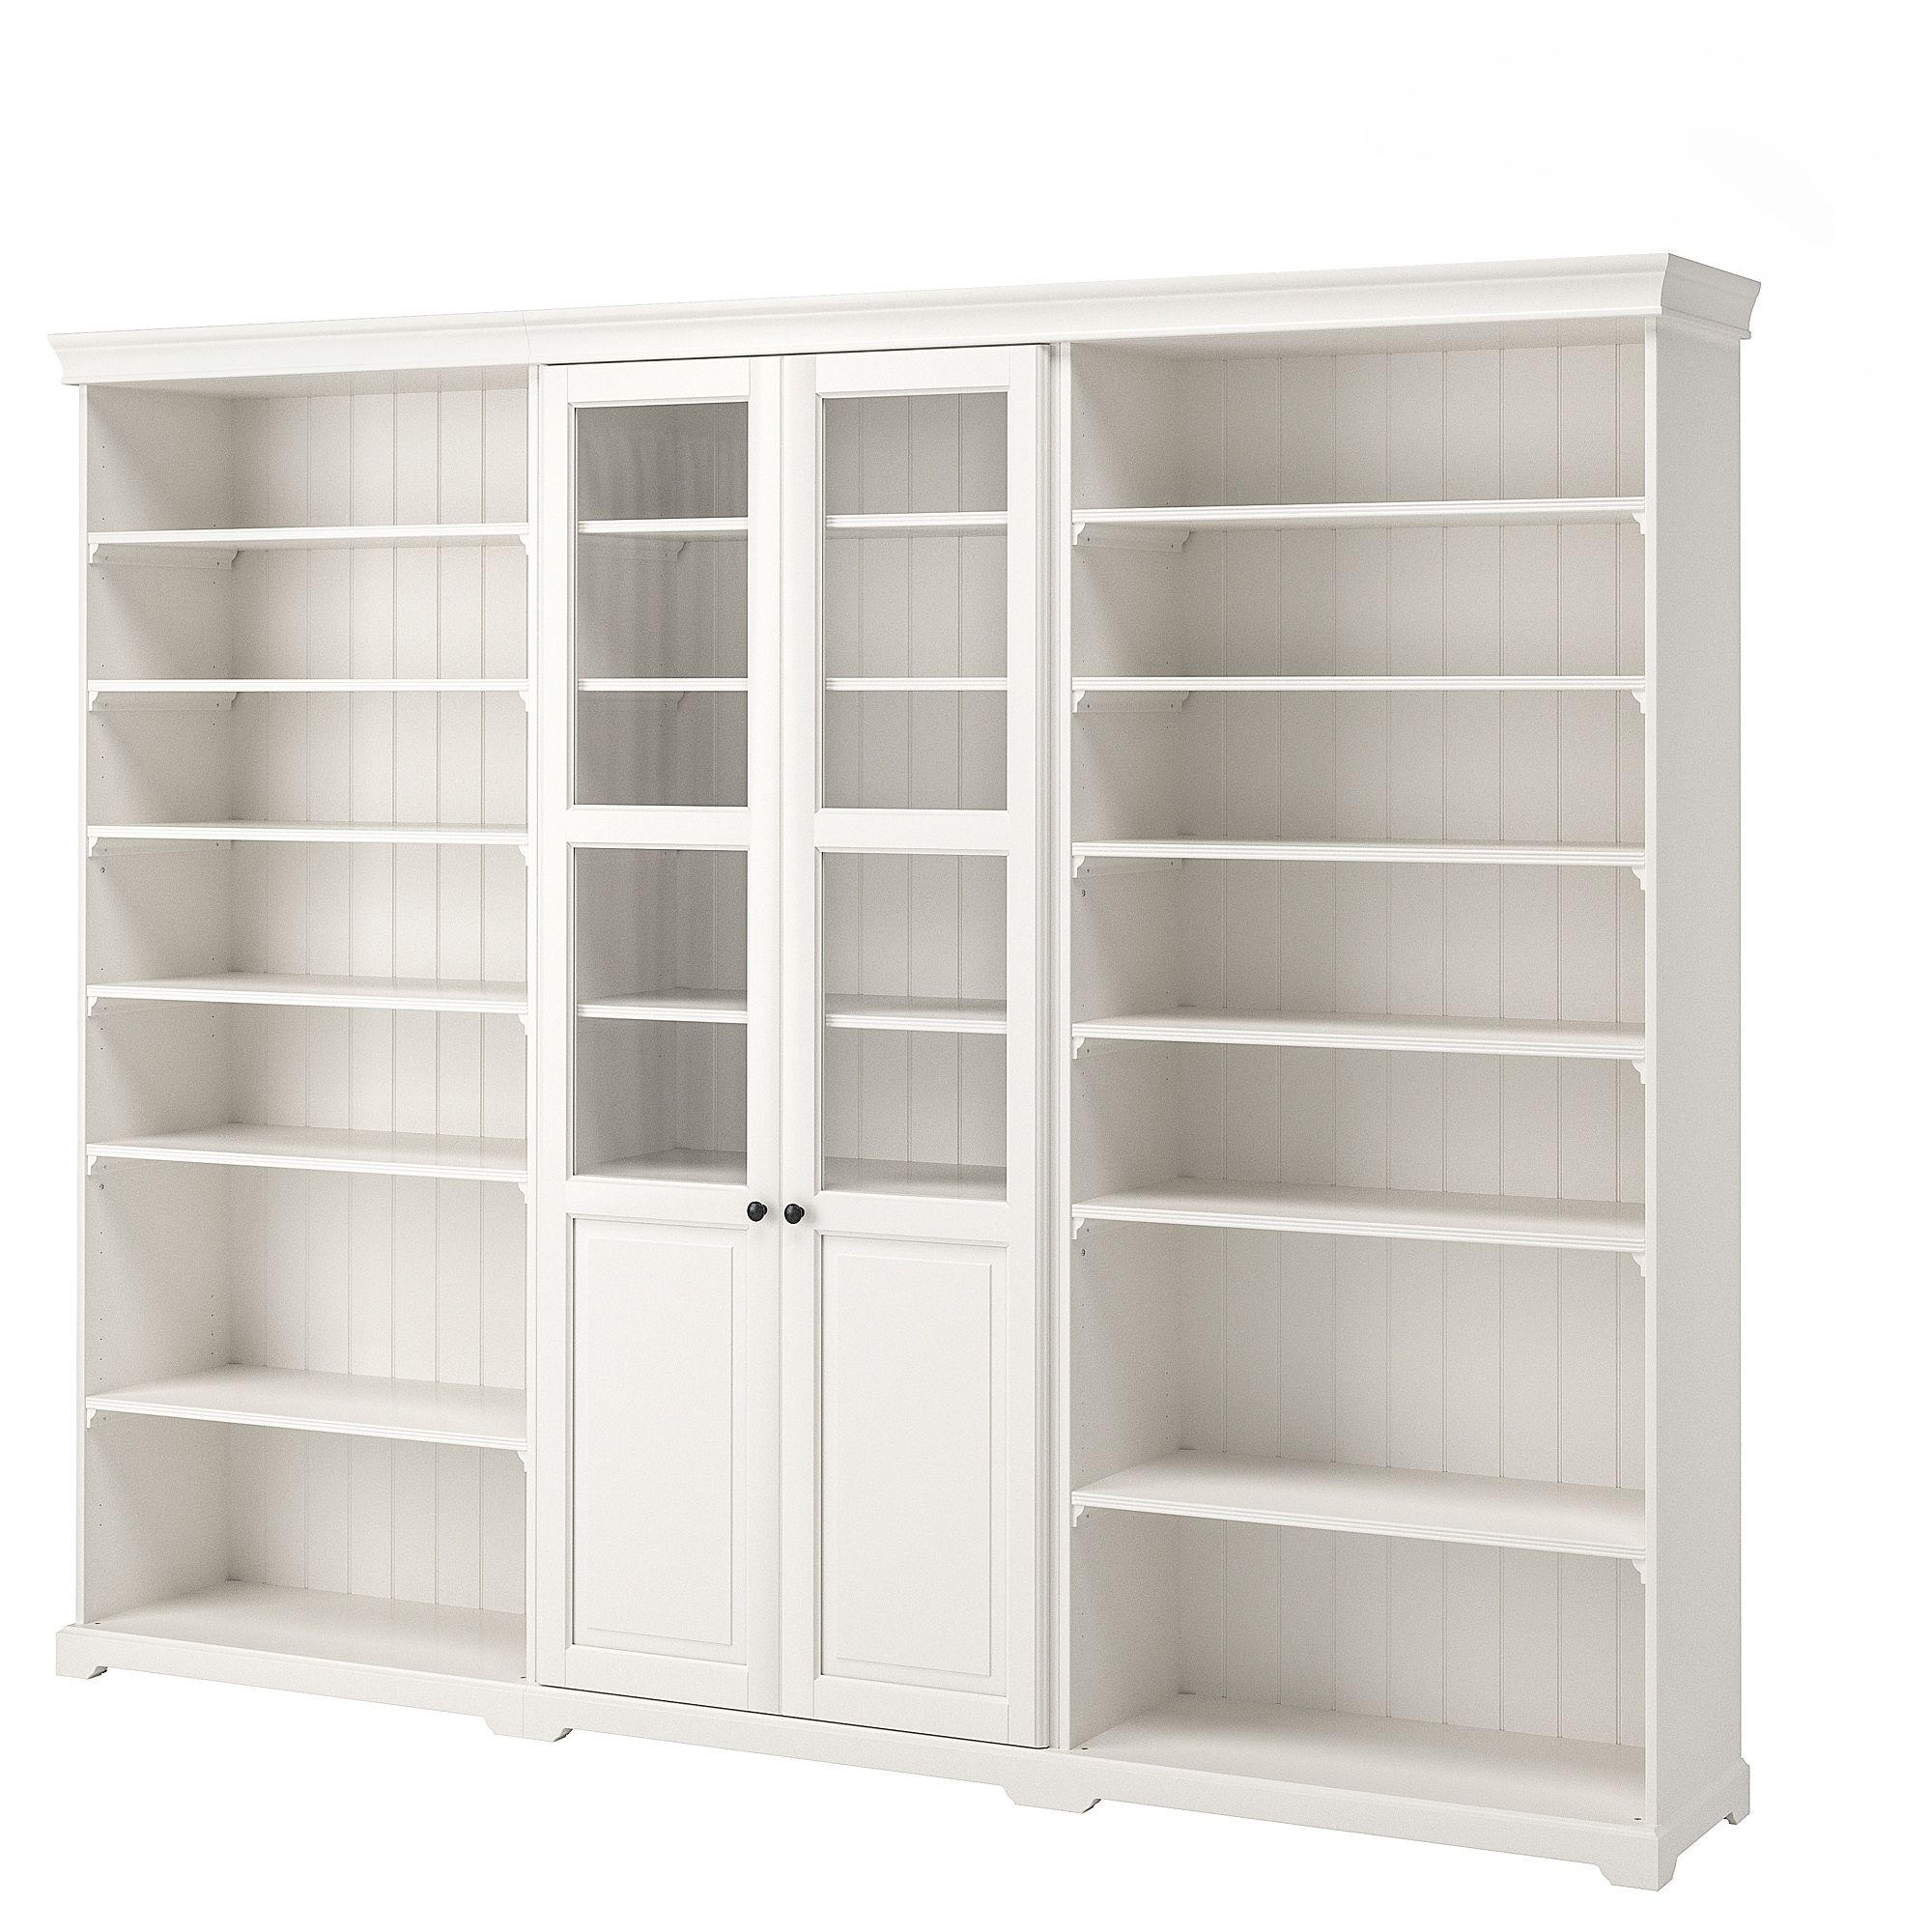 Liatorp Storage Combination White 276x214 Cm Liatorp Shelves